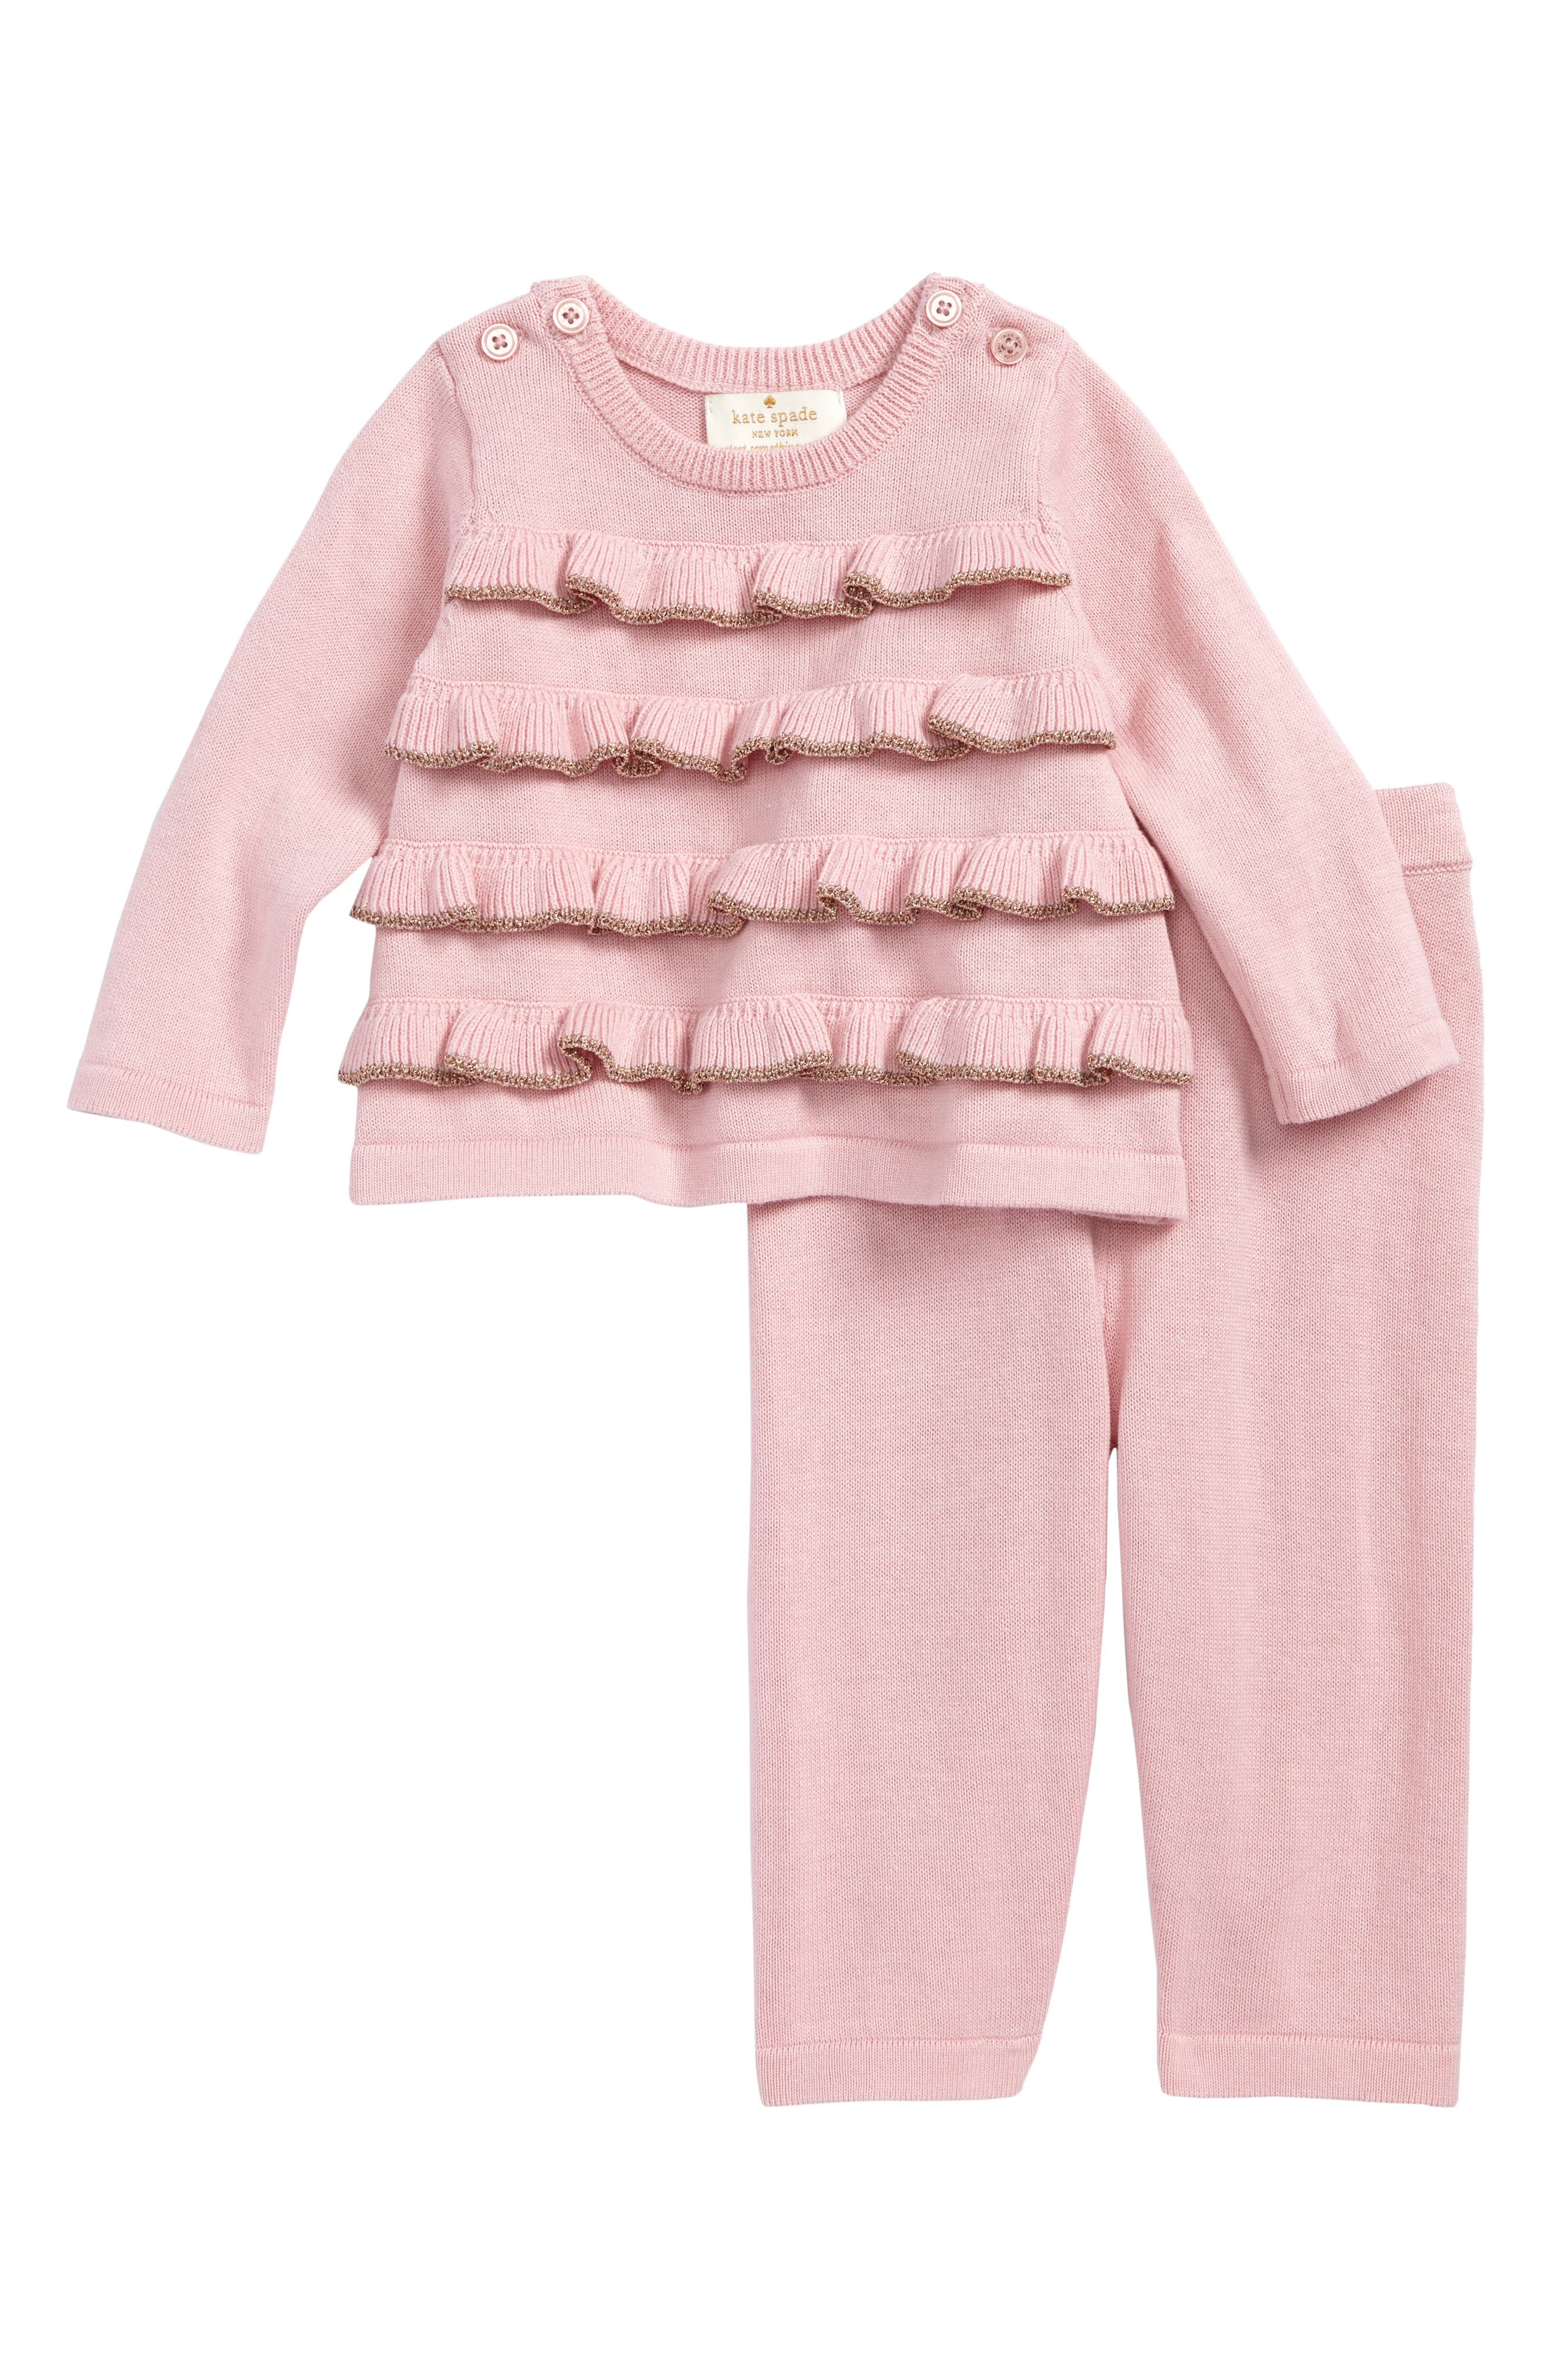 kate spade new york ruffle front sweater & leggings set (Baby Girls)